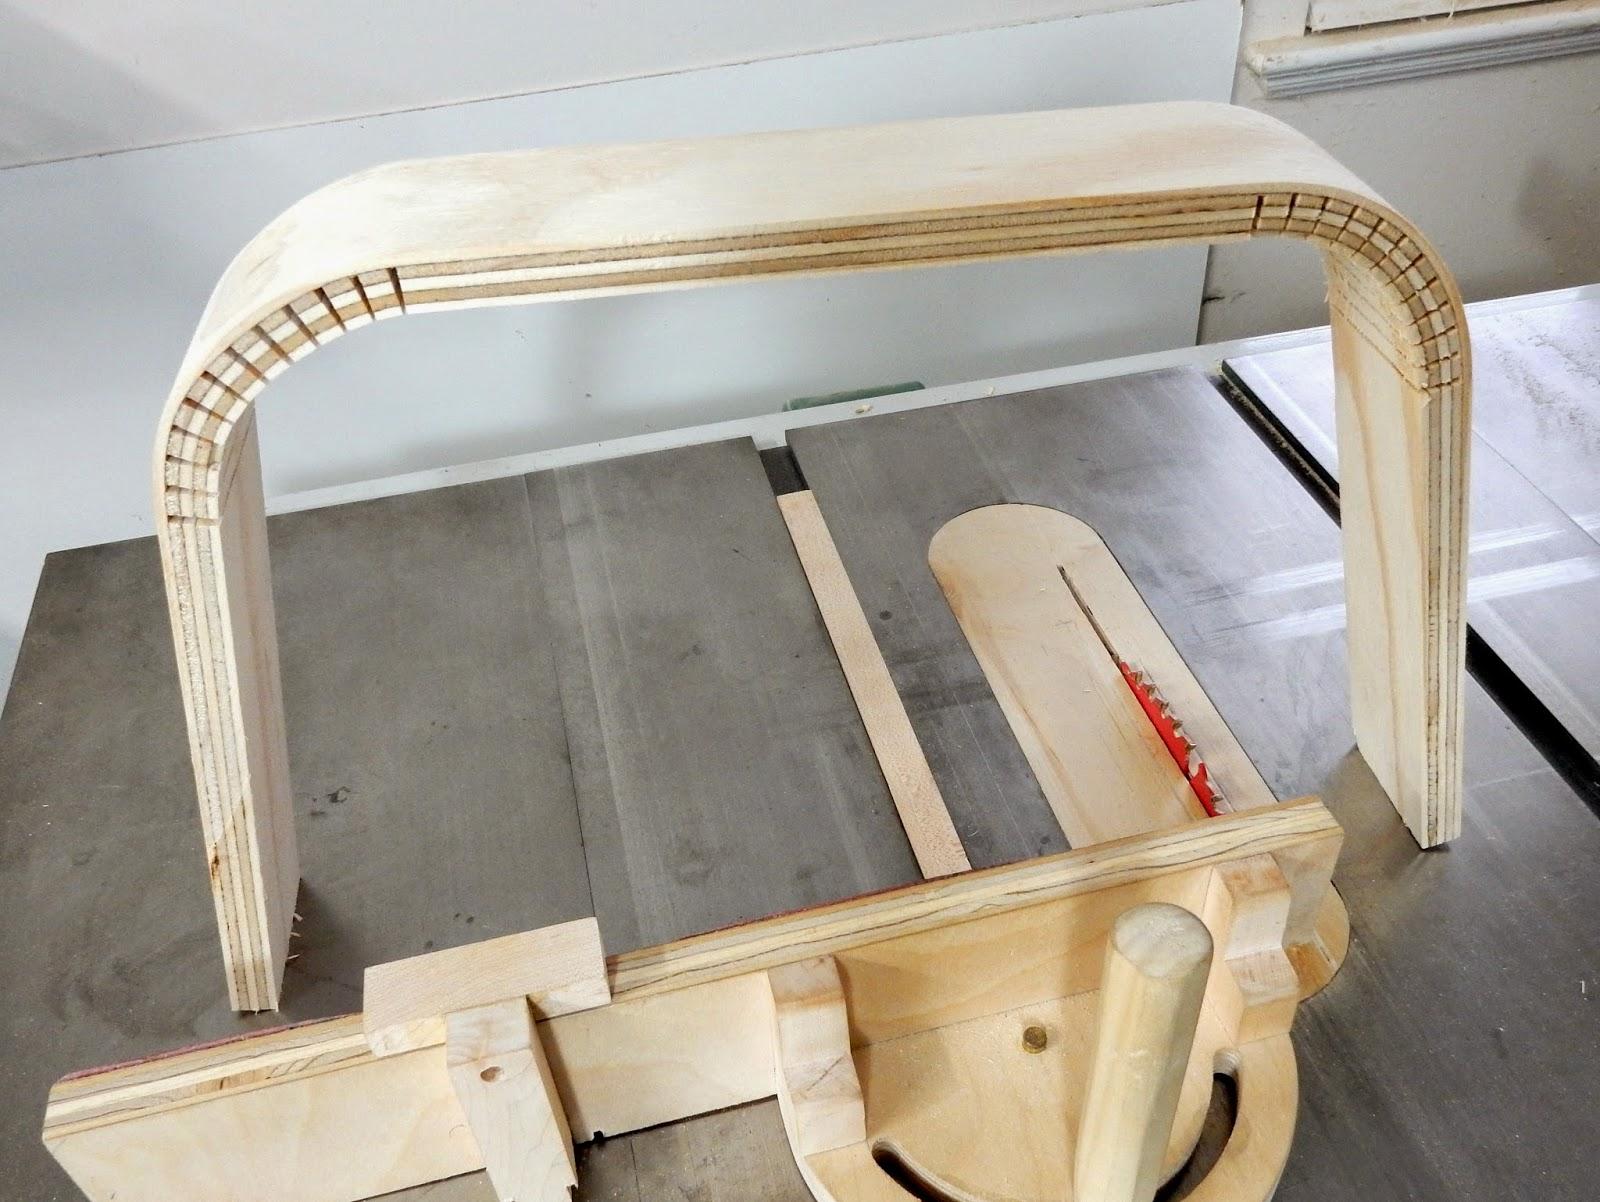 woodworking kerf cut